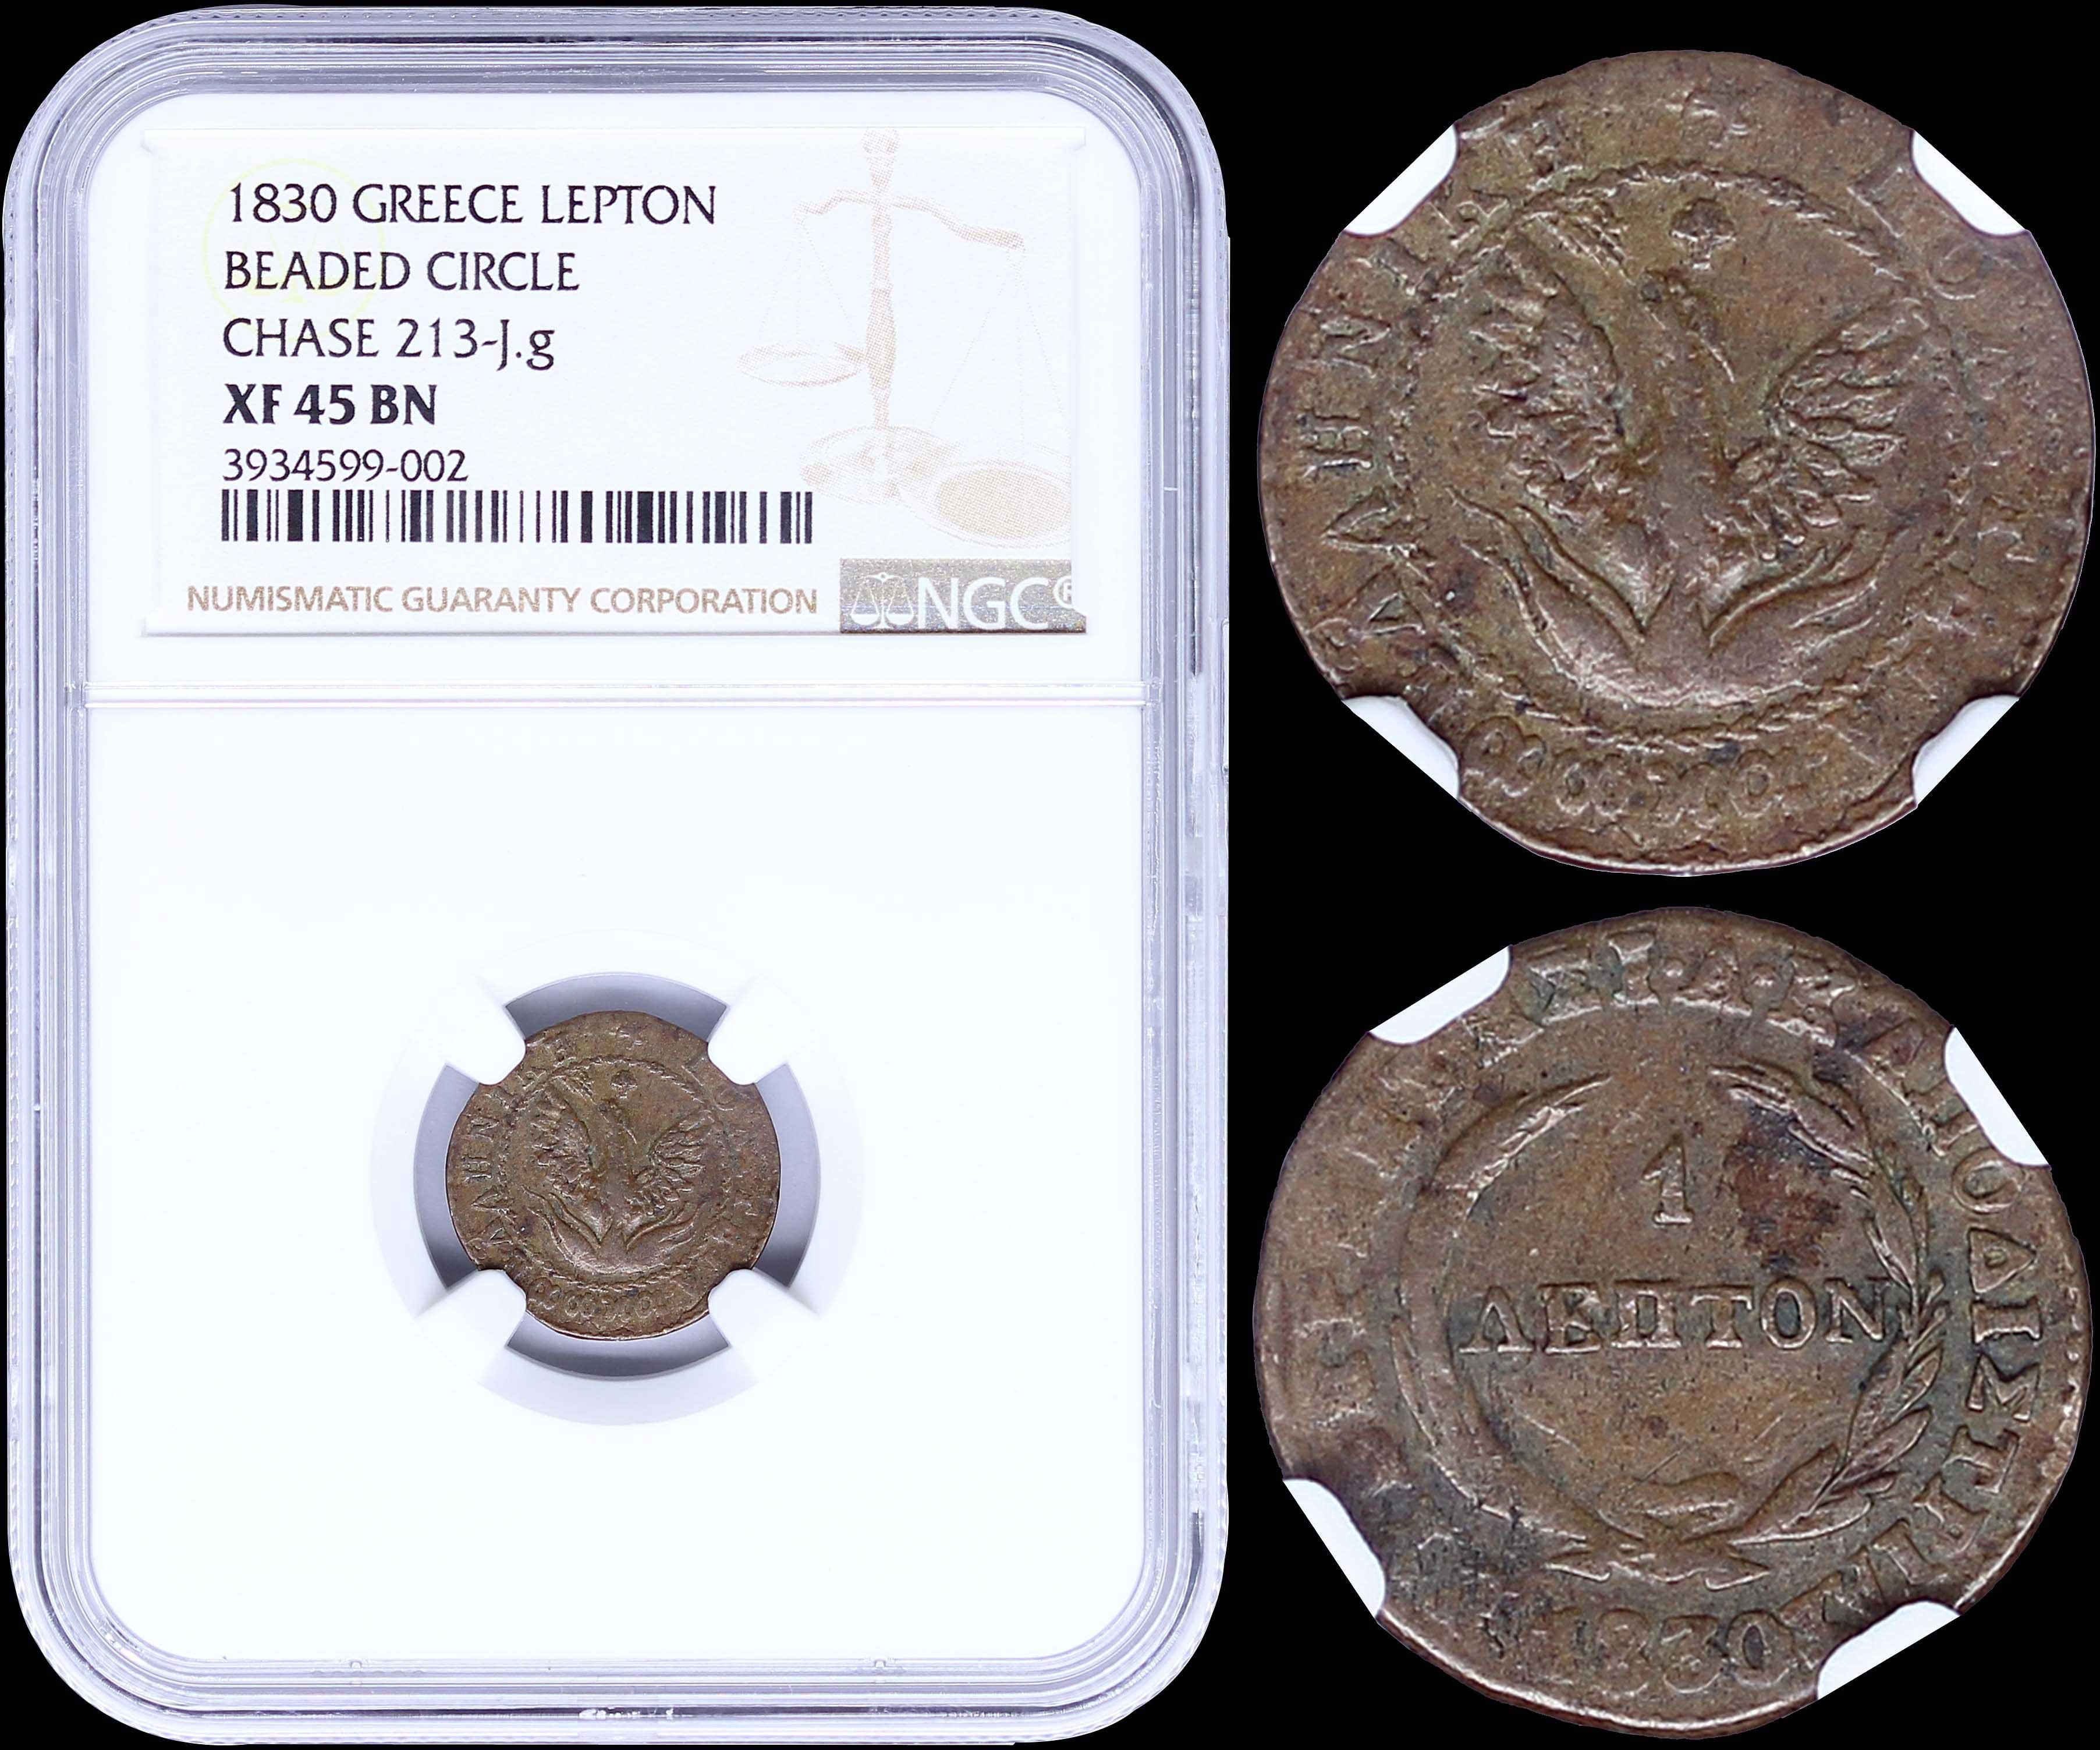 Lot 6019 - -  COINS & TOKENS governor capodistrias -  A. Karamitsos Public & Live Bid Auction 636 Coins, Medals & Banknotes